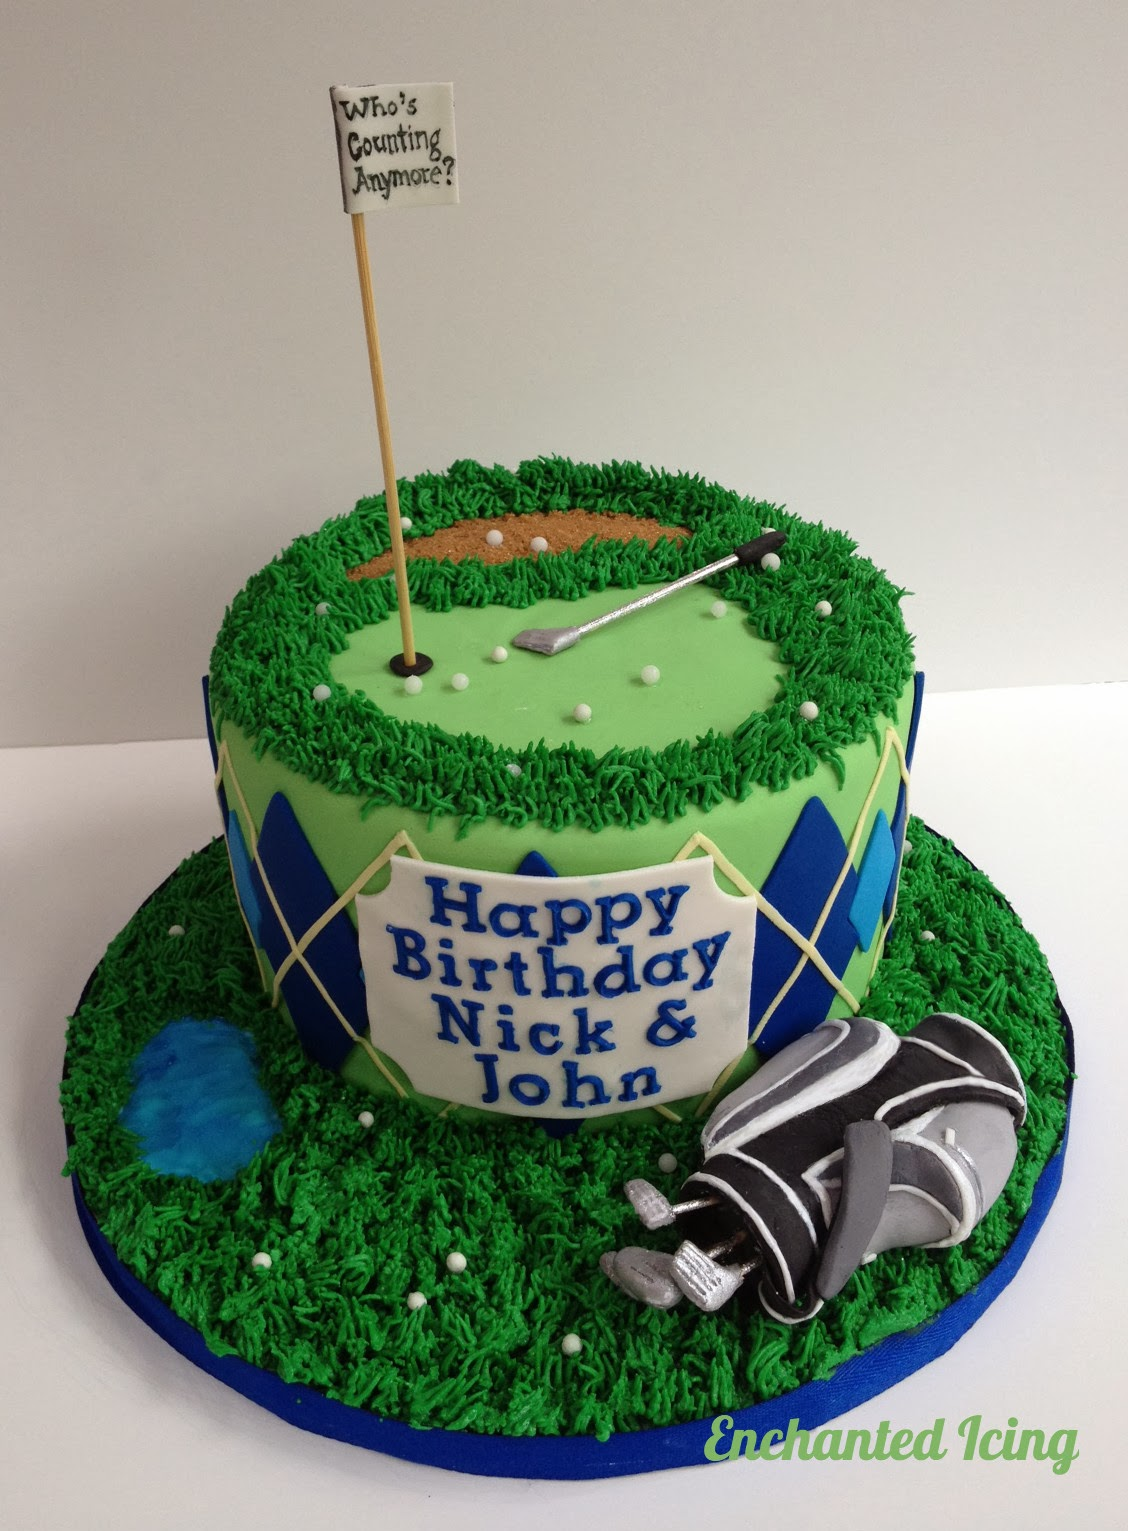 Birthday Cake Golfing Image Inspiration of Cake and Birthday